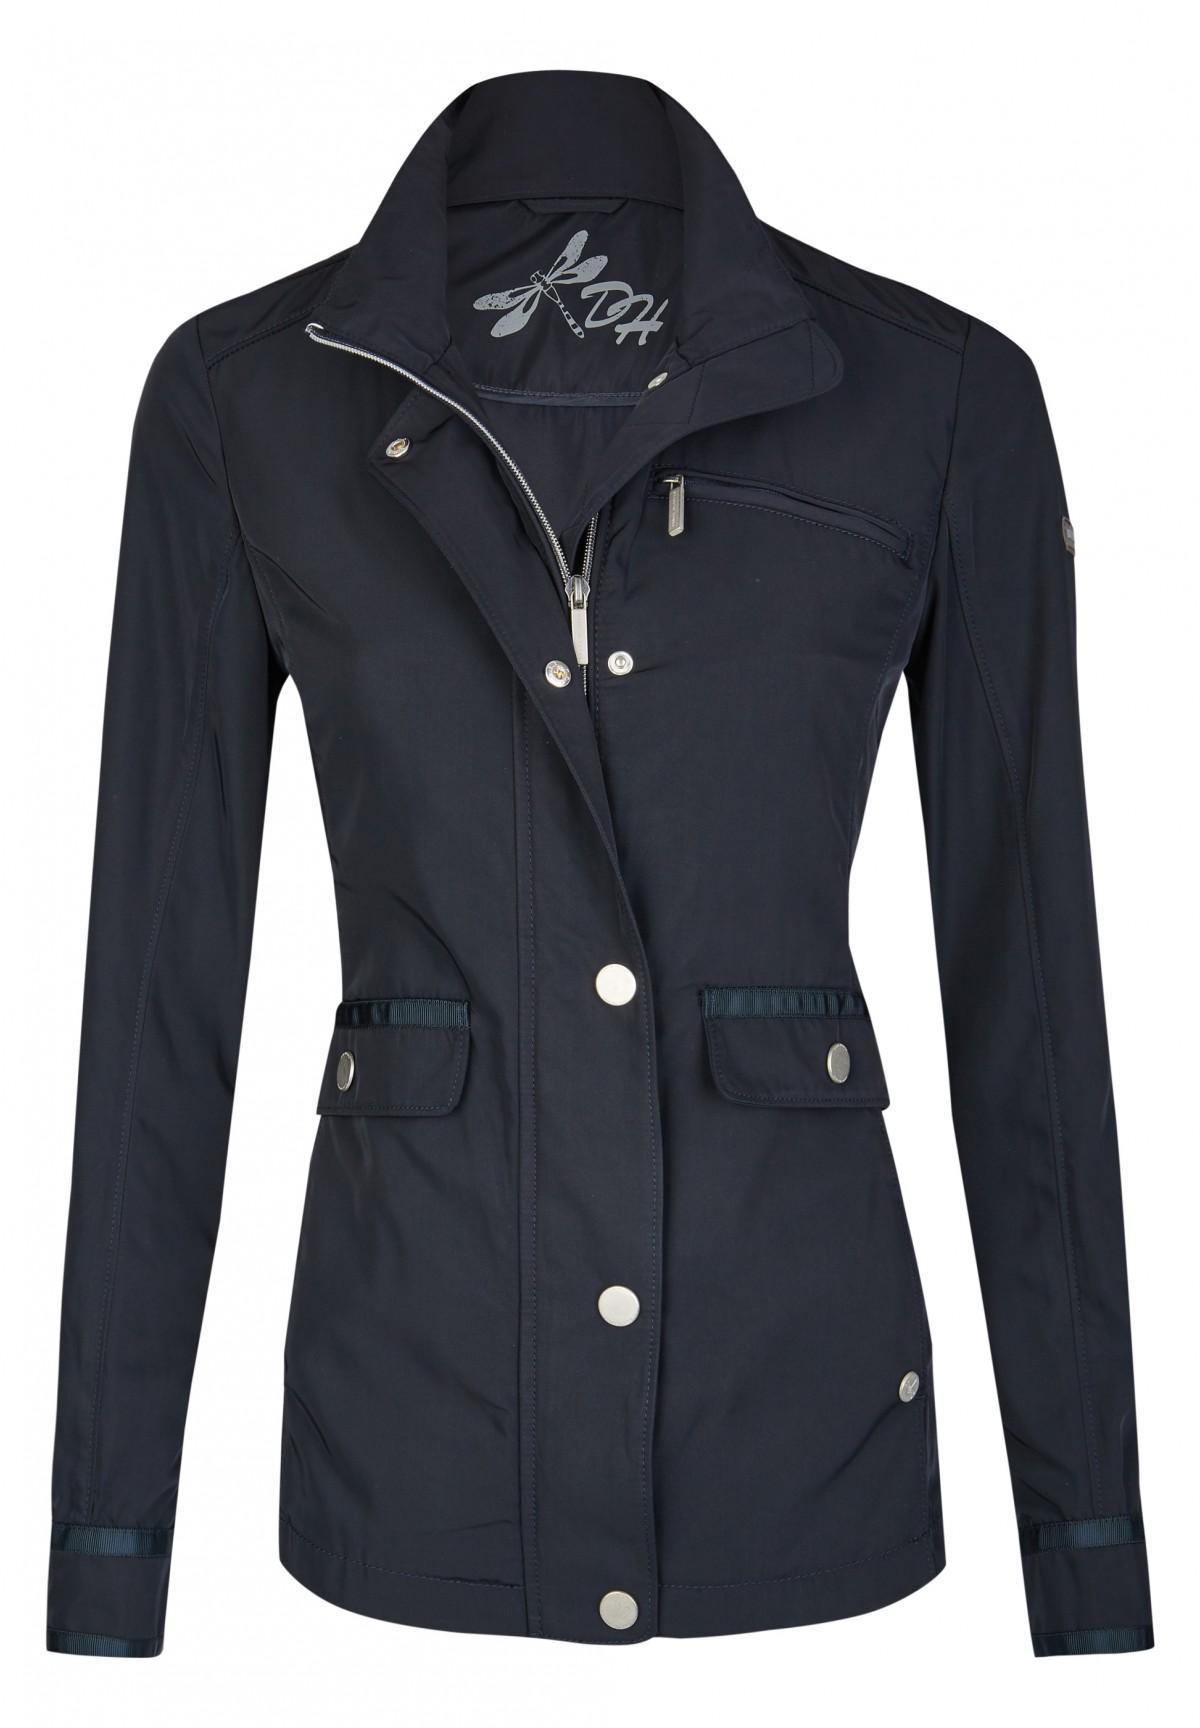 Modische Jacke / Jacket